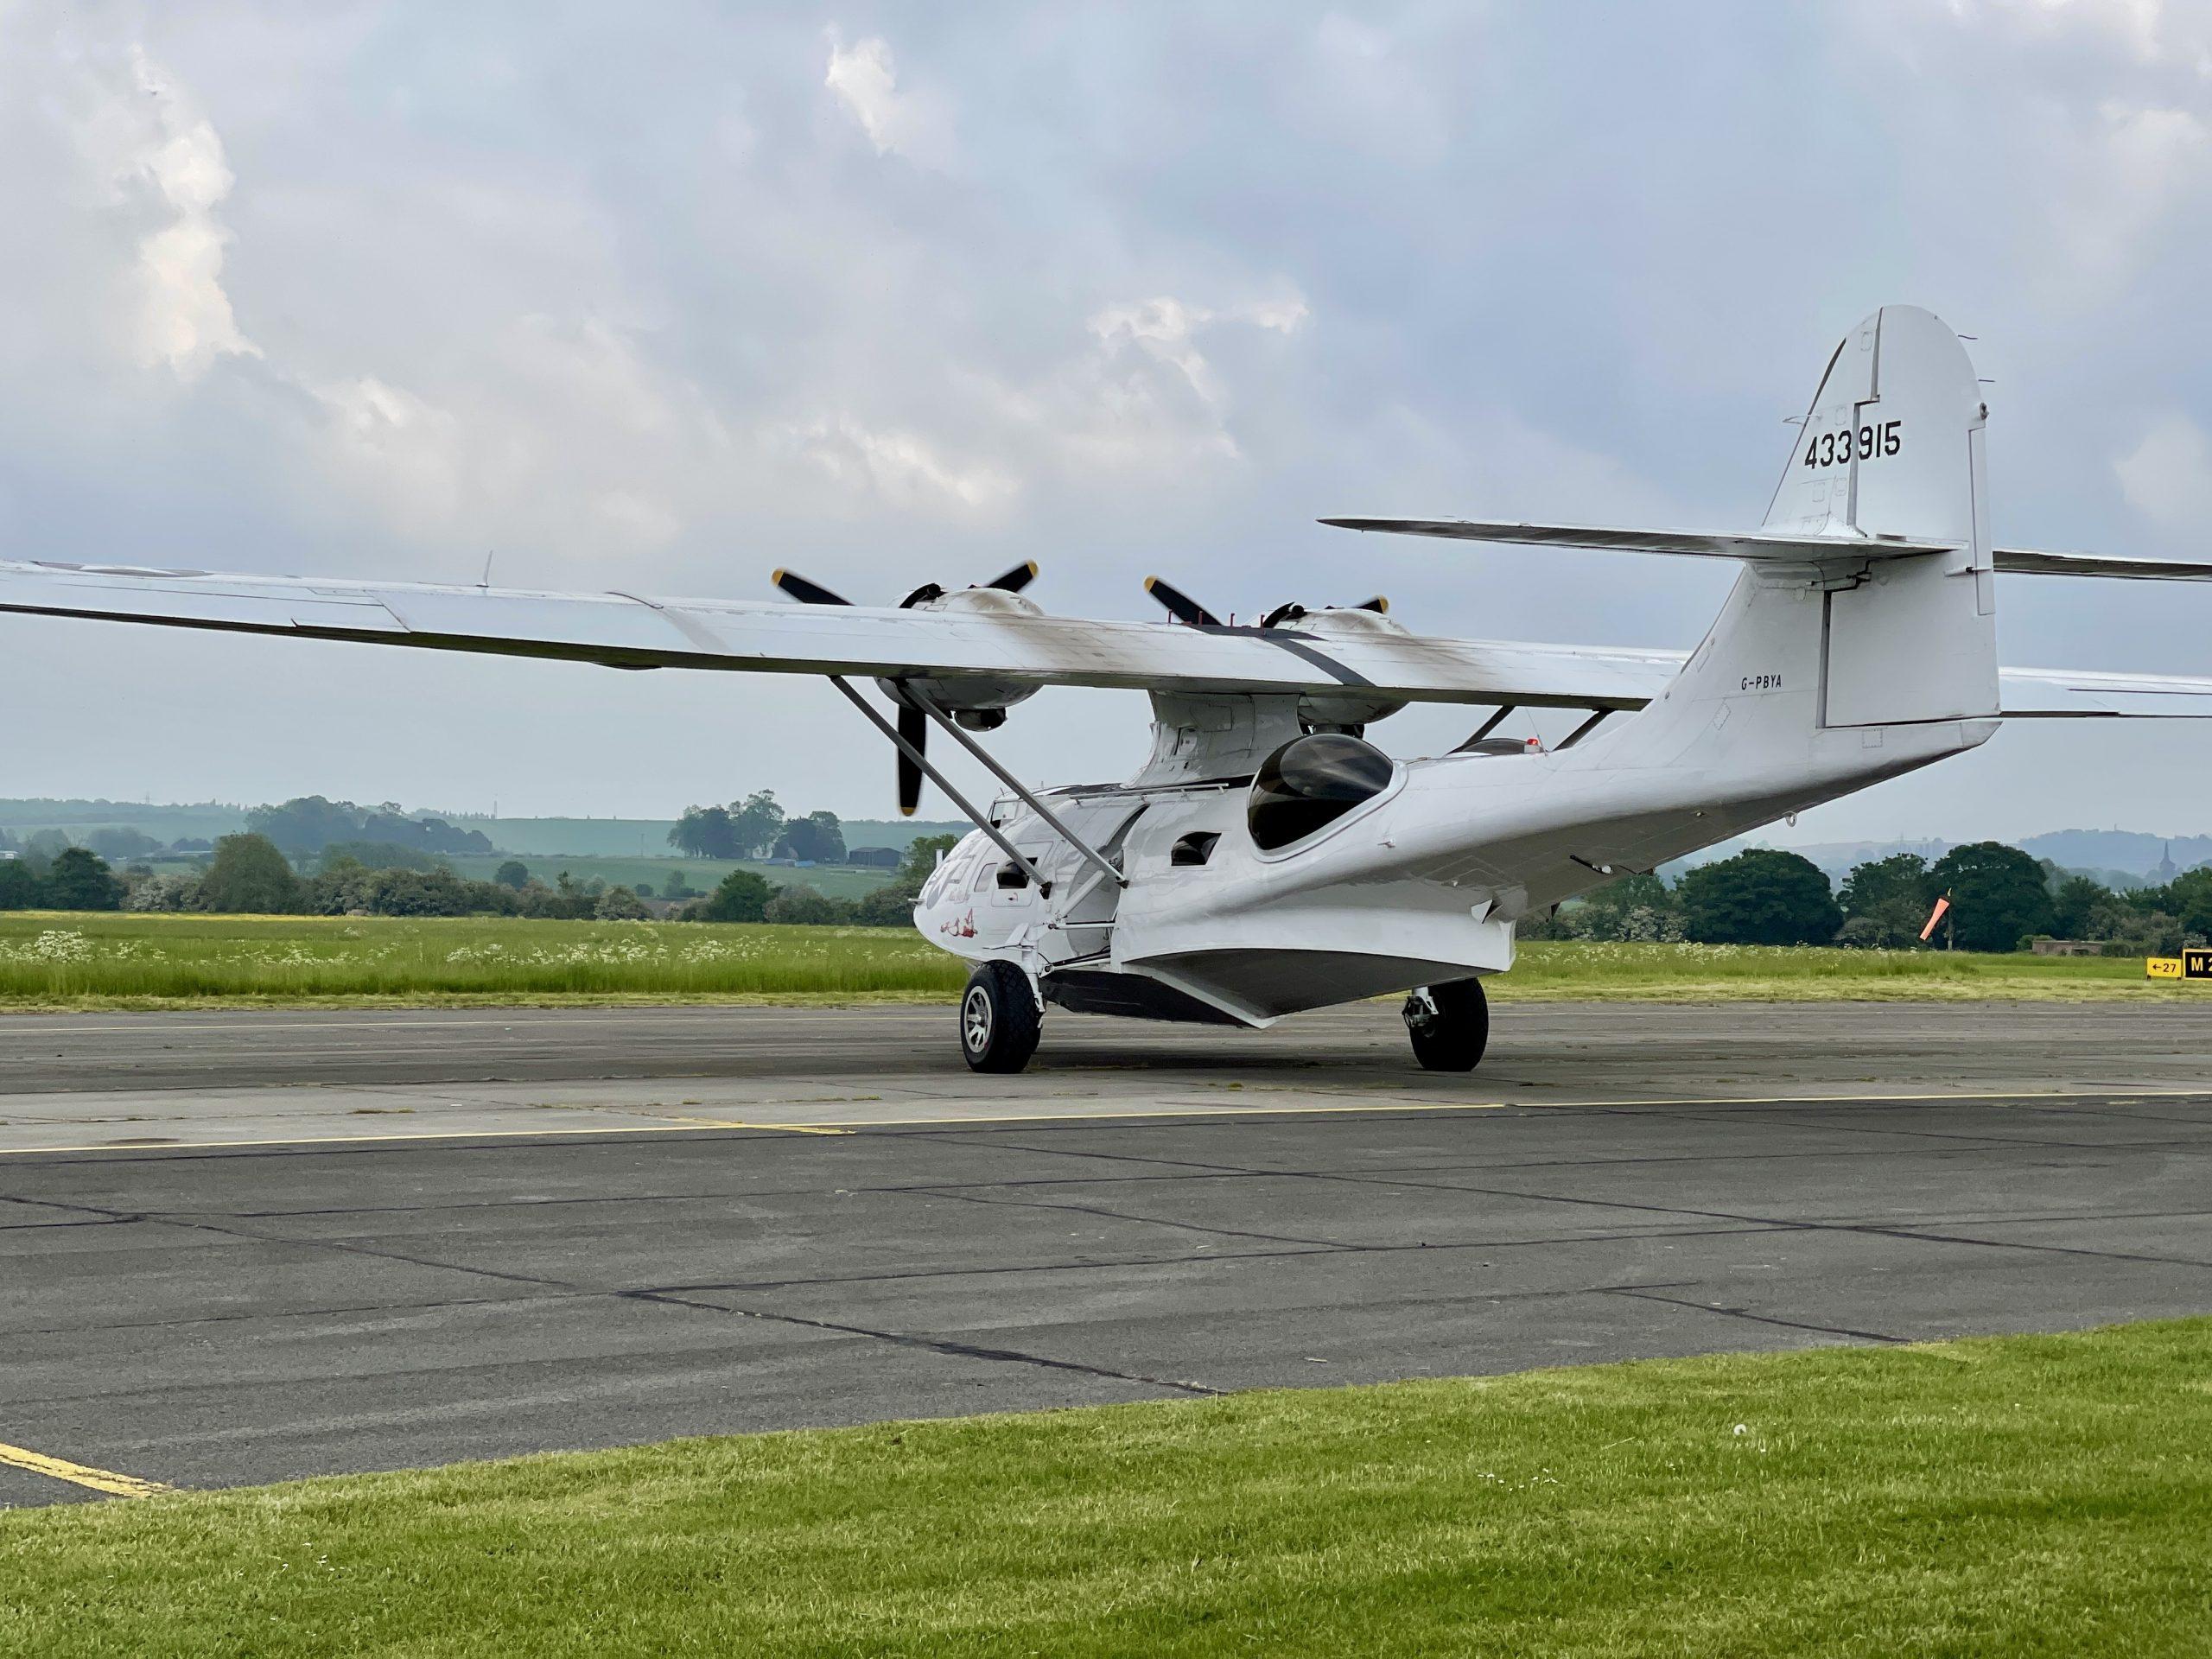 PBY Catalina World War 2 Flying Boat